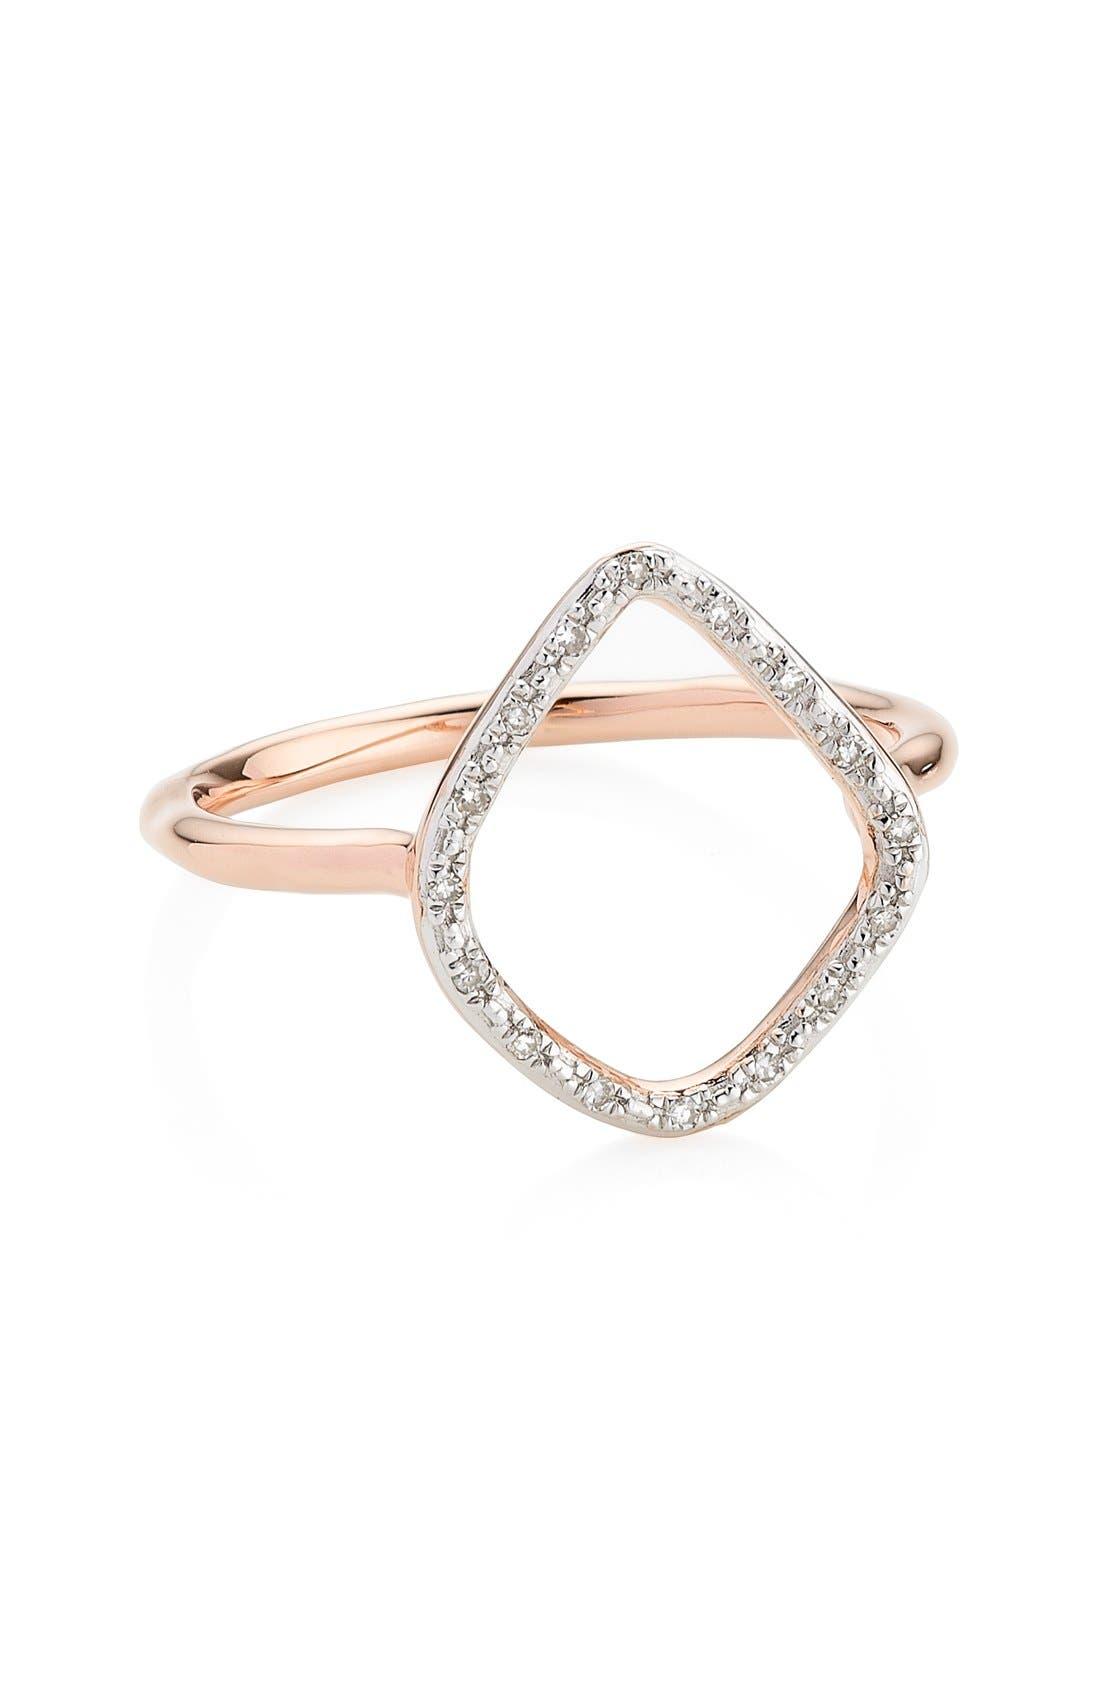 Womens Precious Gems Jewelry Nordstrom